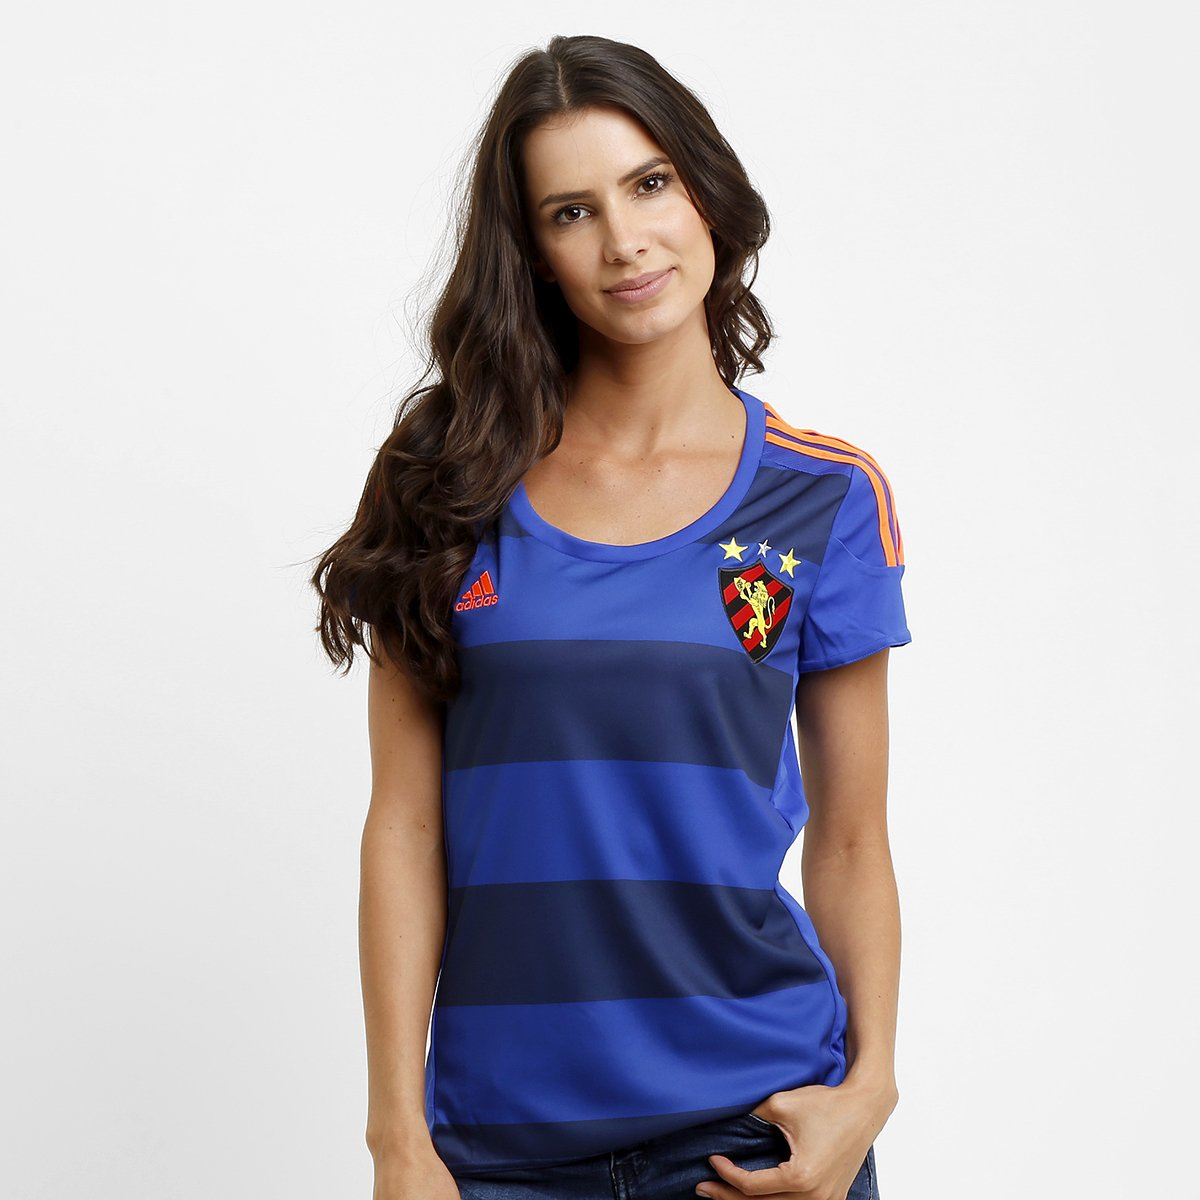 Camisa Feminina Adidas Sport Recife III 15 16 s nº - Compre Agora ... 352c9c44f49d4